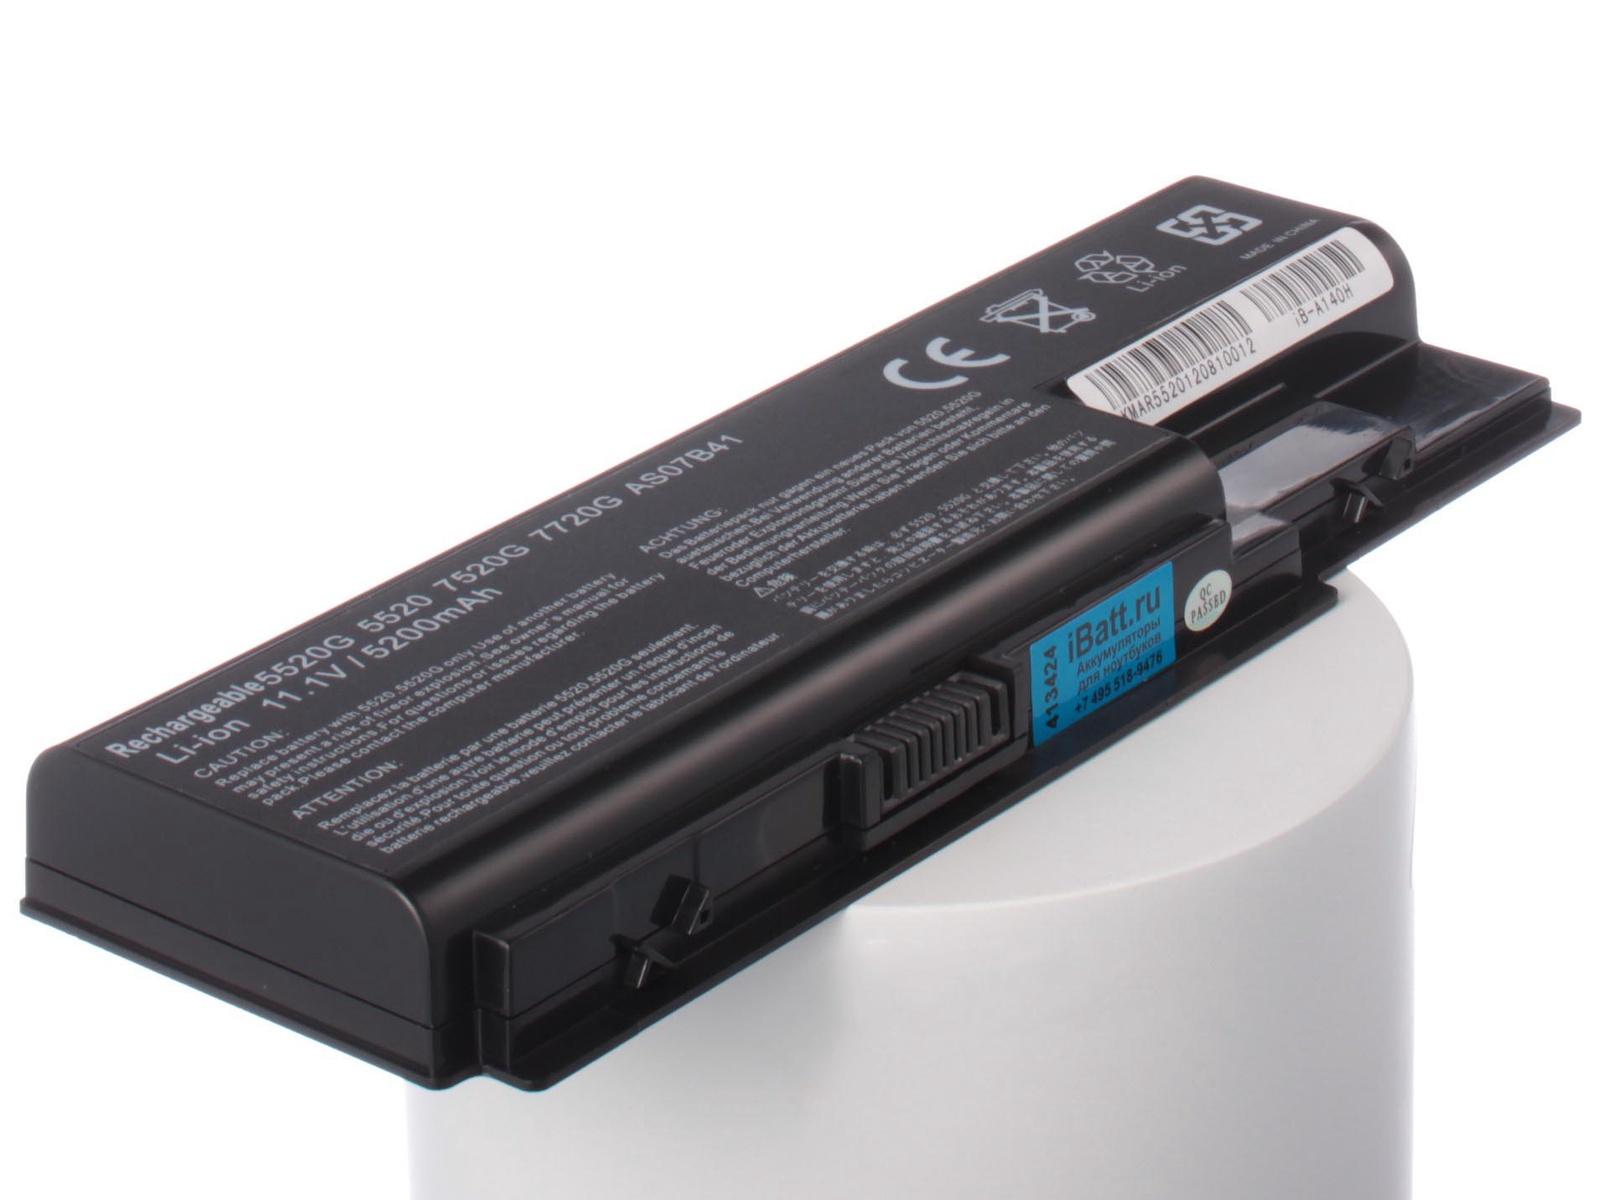 Аккумулятор для ноутбука iBatt для Acer Aspire 7540G-304G32Mi, Extensa 7630Z, Aspire 5710Z, Aspire 5720G-302G16Mi, Aspire 5920G-1A1G16Mi, Aspire 7736ZG-444G32Mi, Aspire 5730ZG-323G25MI, Aspire 8730G, Aspire 5530-602G16Mi блок питания palmexx 19v 3 42a для aspire one timelinex 1830 ferrari one travelmate extensa series pa 005